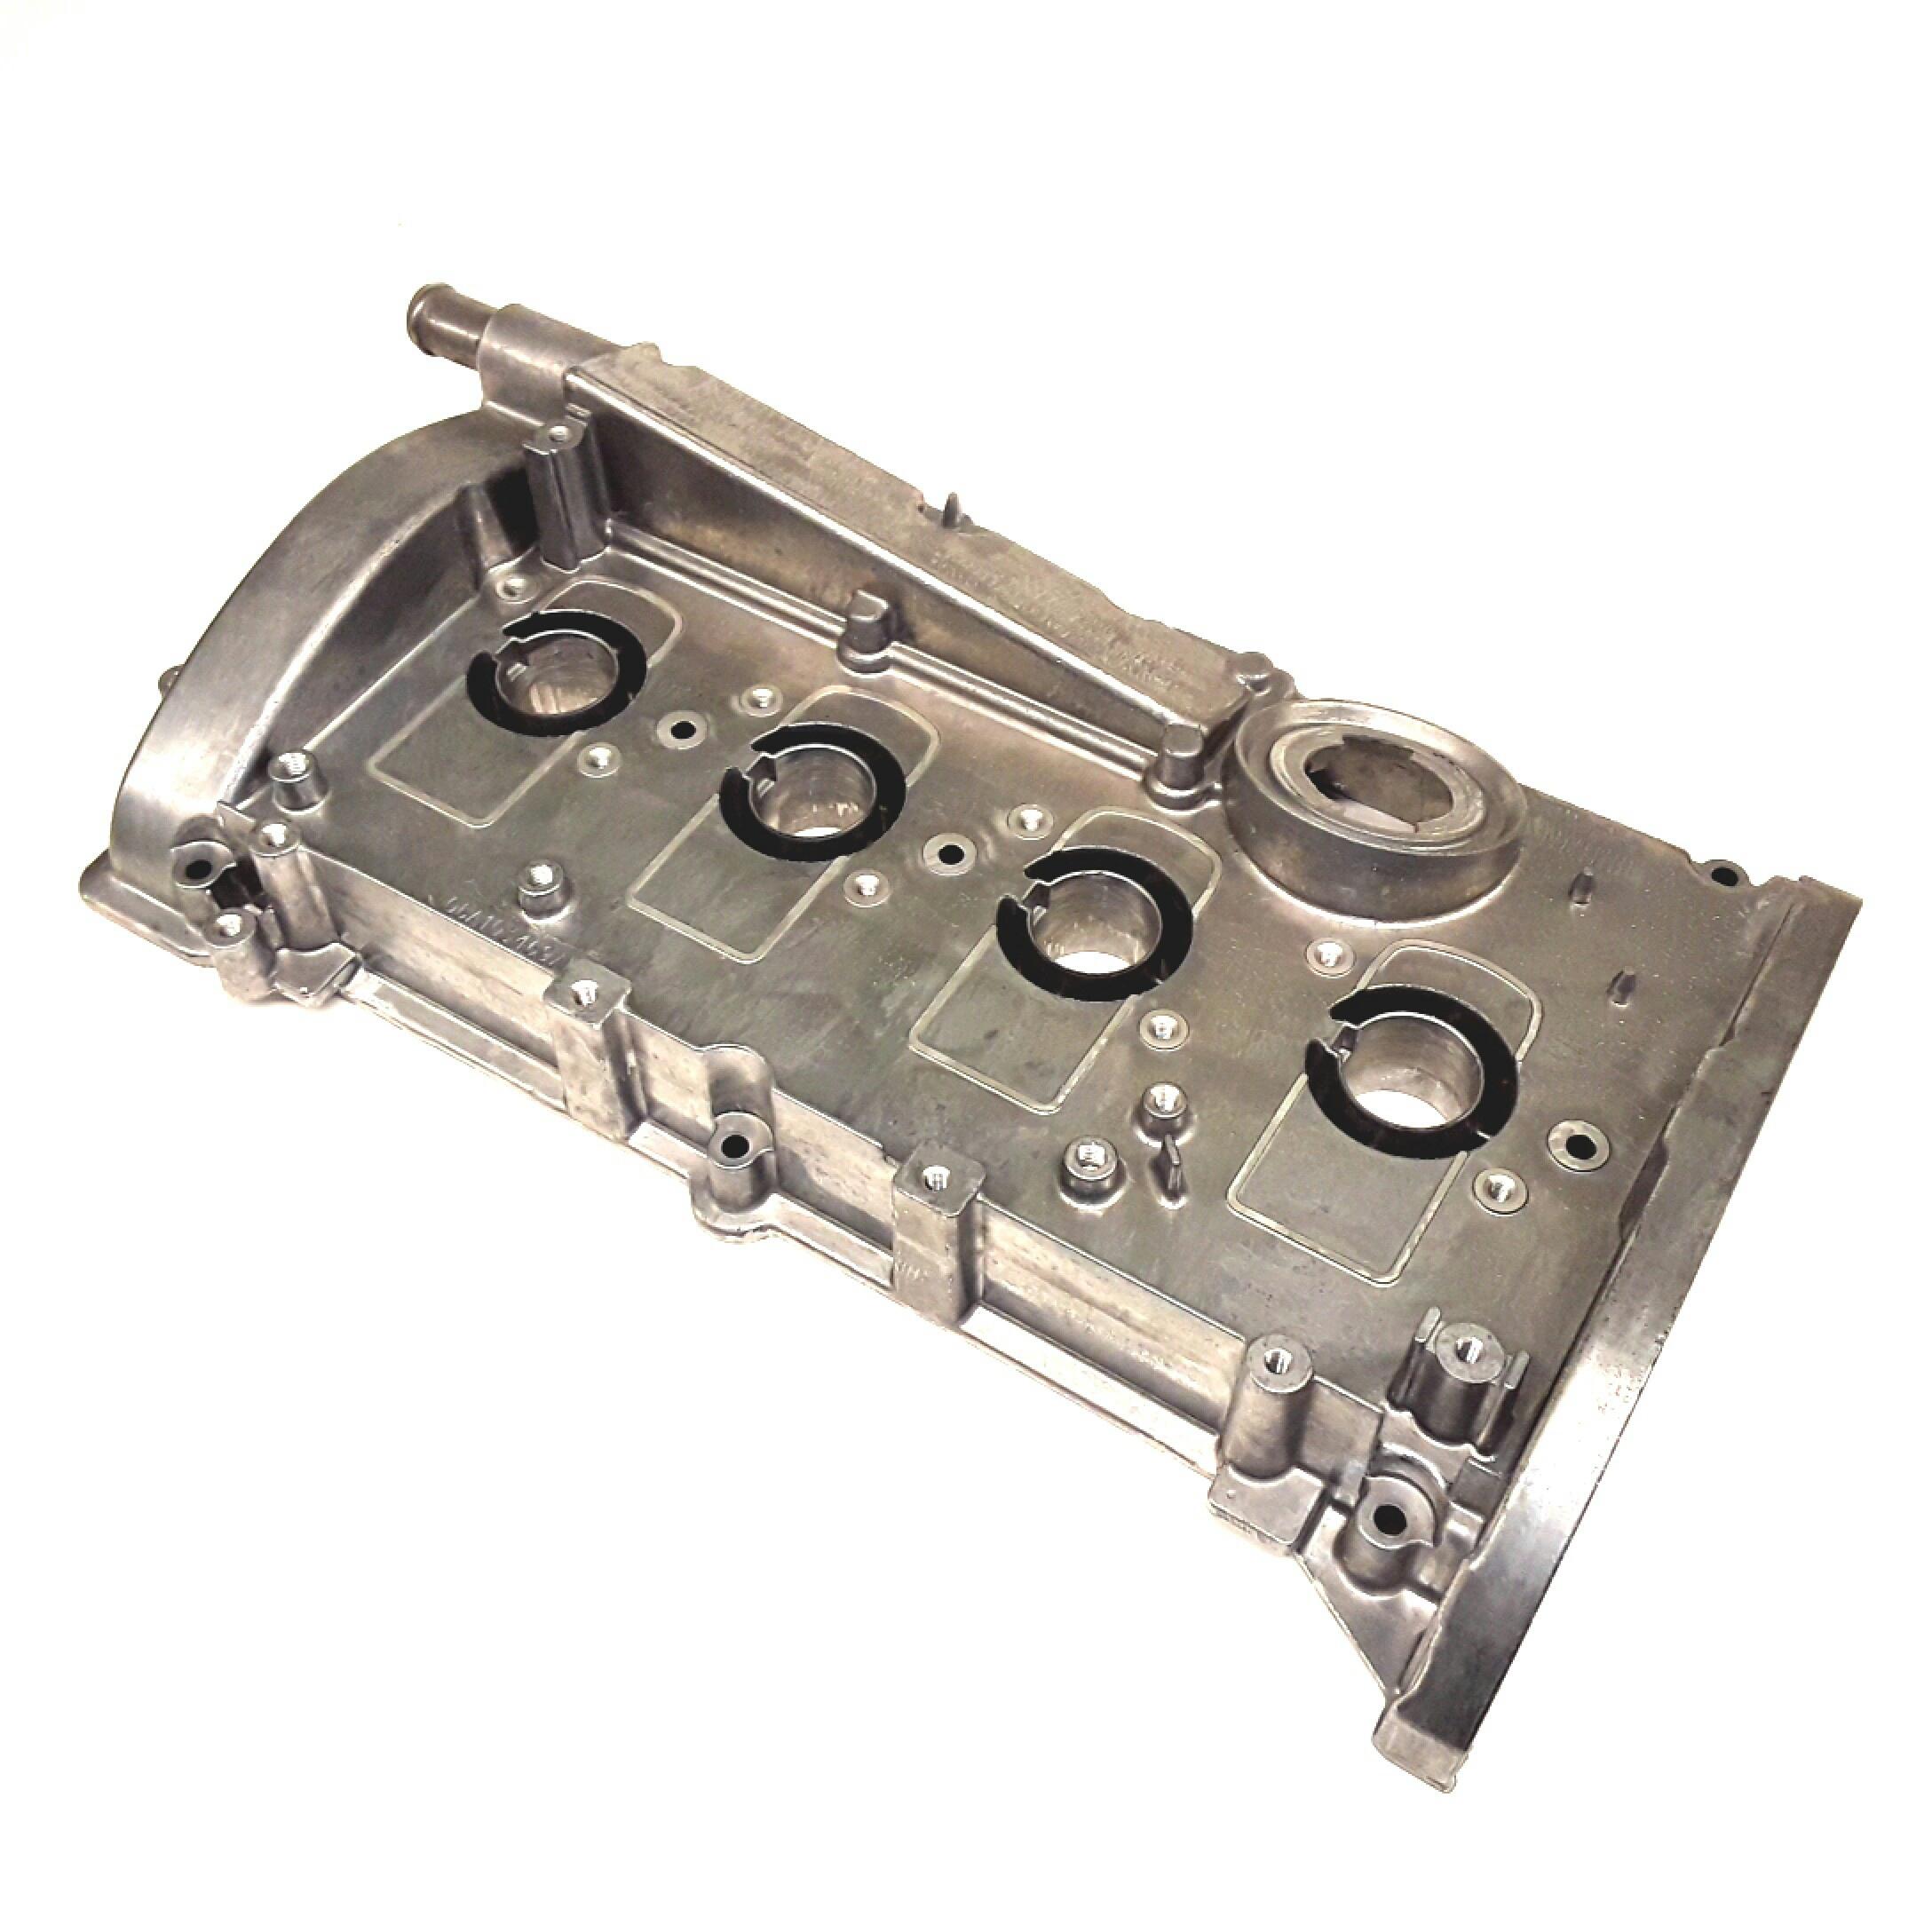 Bmw M30 Wiring Harness Ask Answer Diagram E30 Infiniti G20 Repair Manual Elsalvadorla Wire Cover